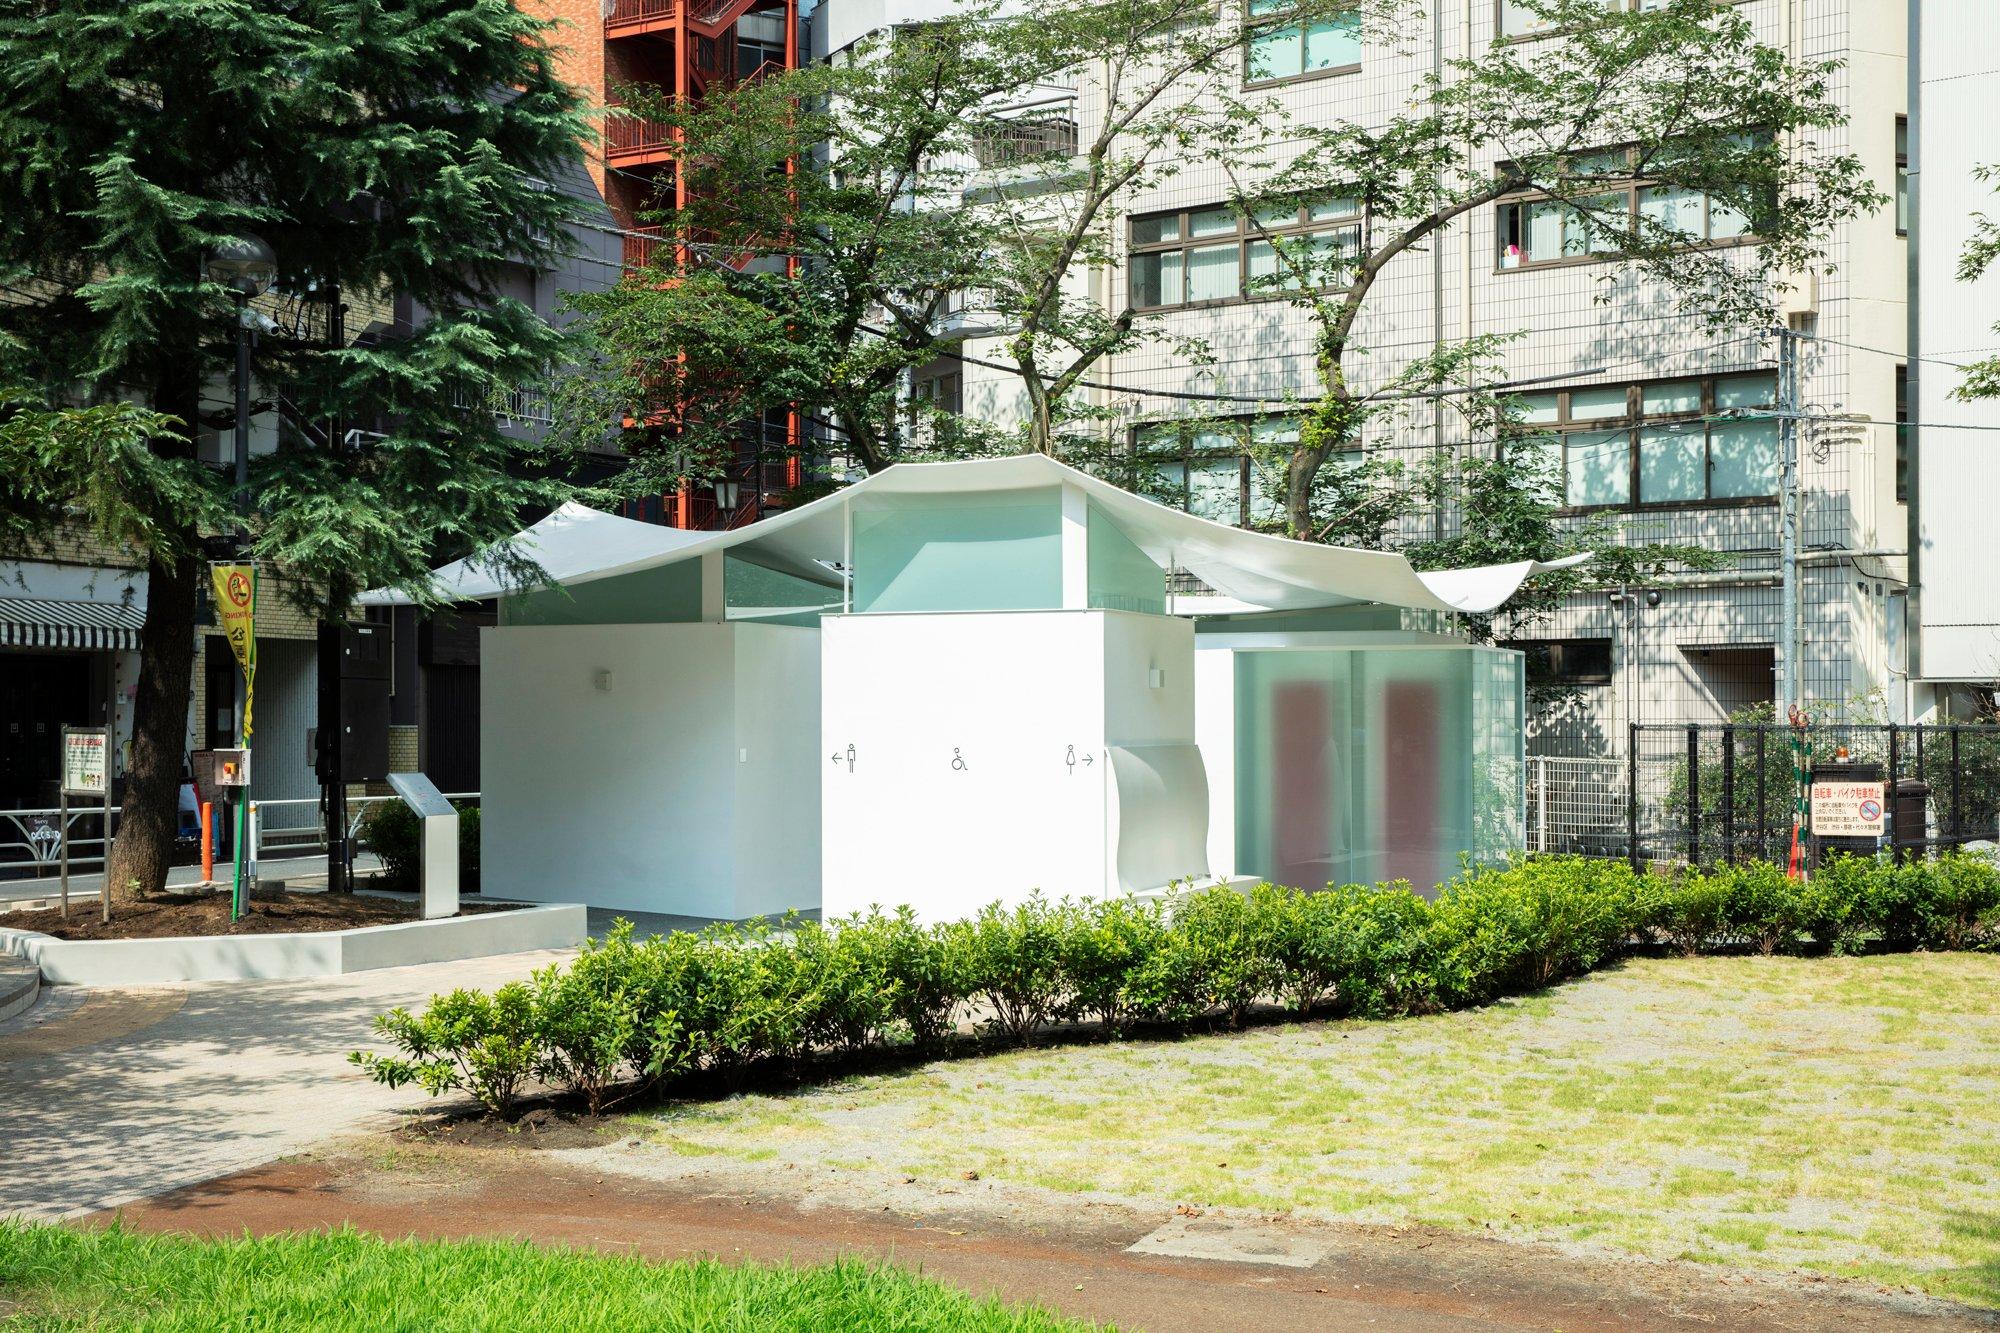 The Tokyo ToiletimEbisu East Parkvon Fumihiko Maki.Foto: Satoshi Nagare / The Nippon Foundation